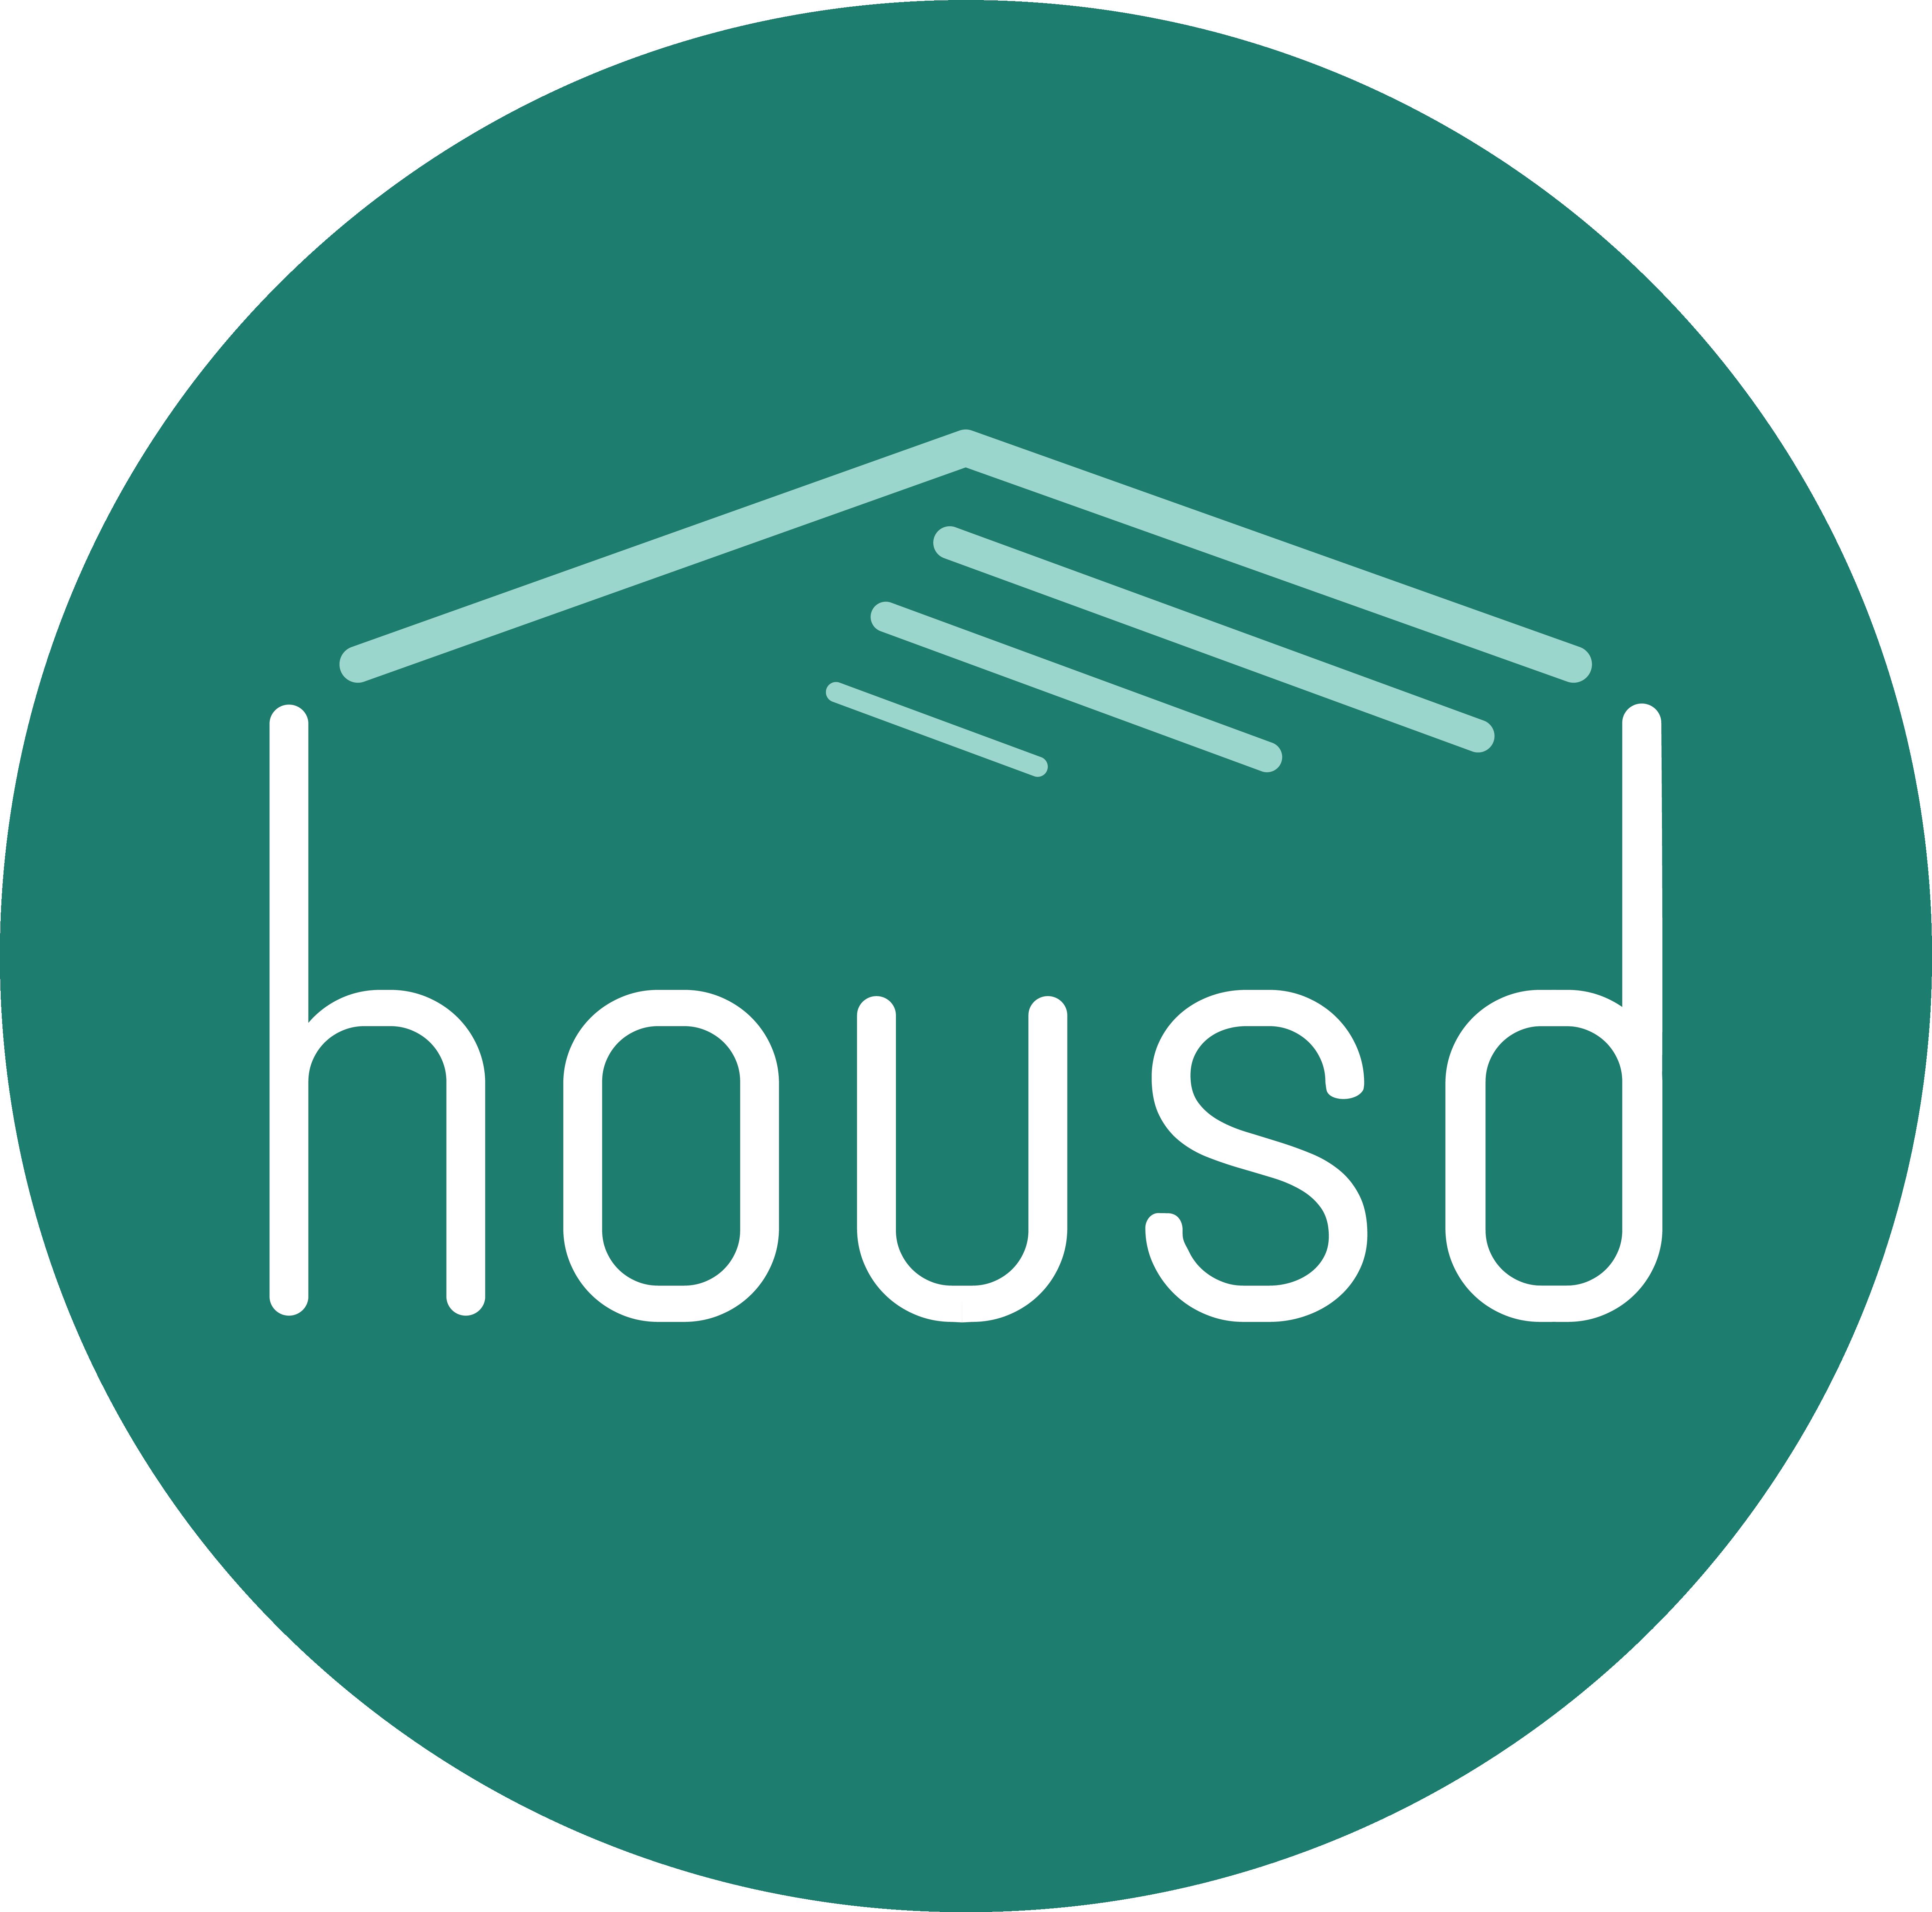 Housd logo